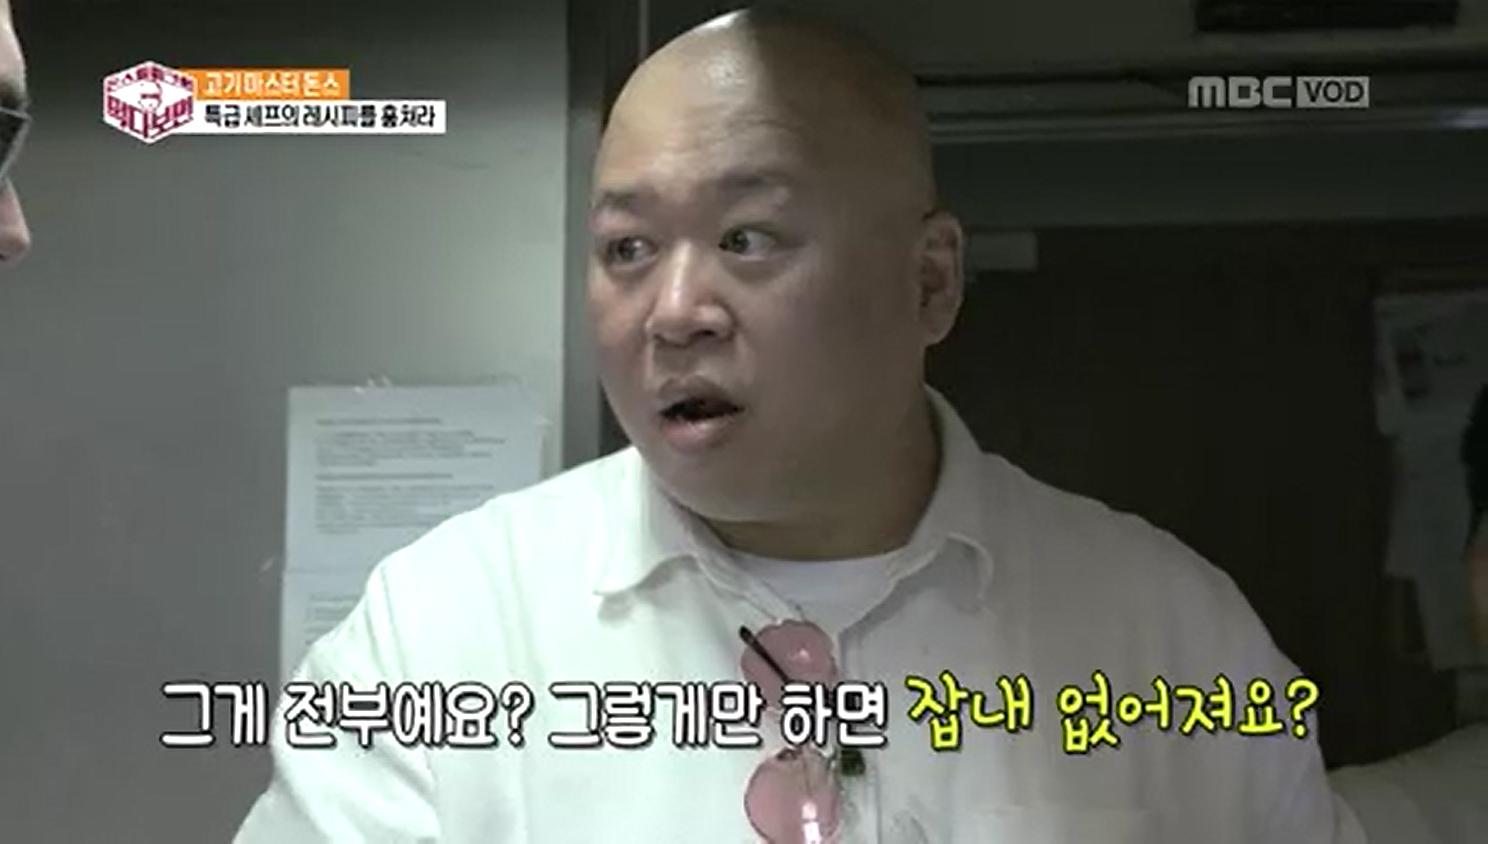 [TV톡] 돈스파이크의 진심을 어찌 '식탐'이라 쉽게 말 할 수 있을까? '돈스파이크의 먹다보면'